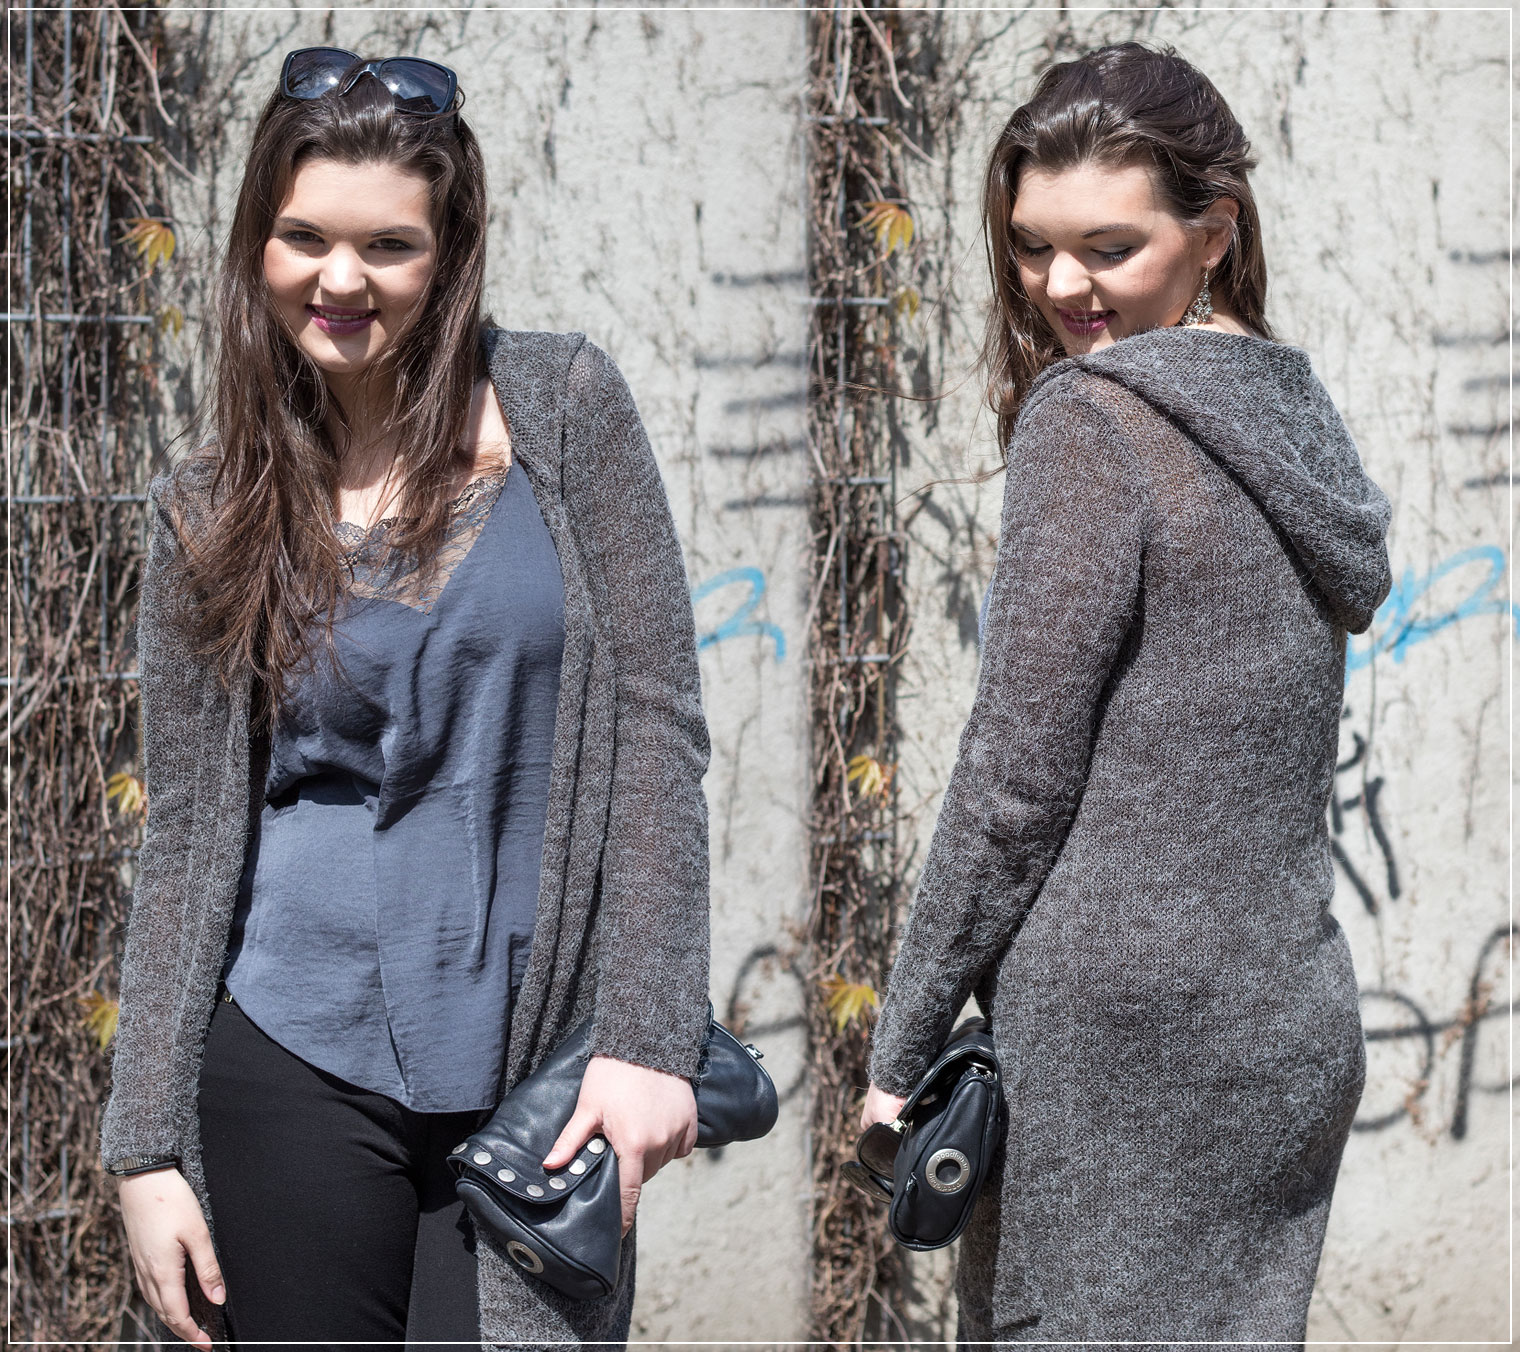 Satin Top, Knitt Coat, Pumps, Polka Dots, Frühlingstrend